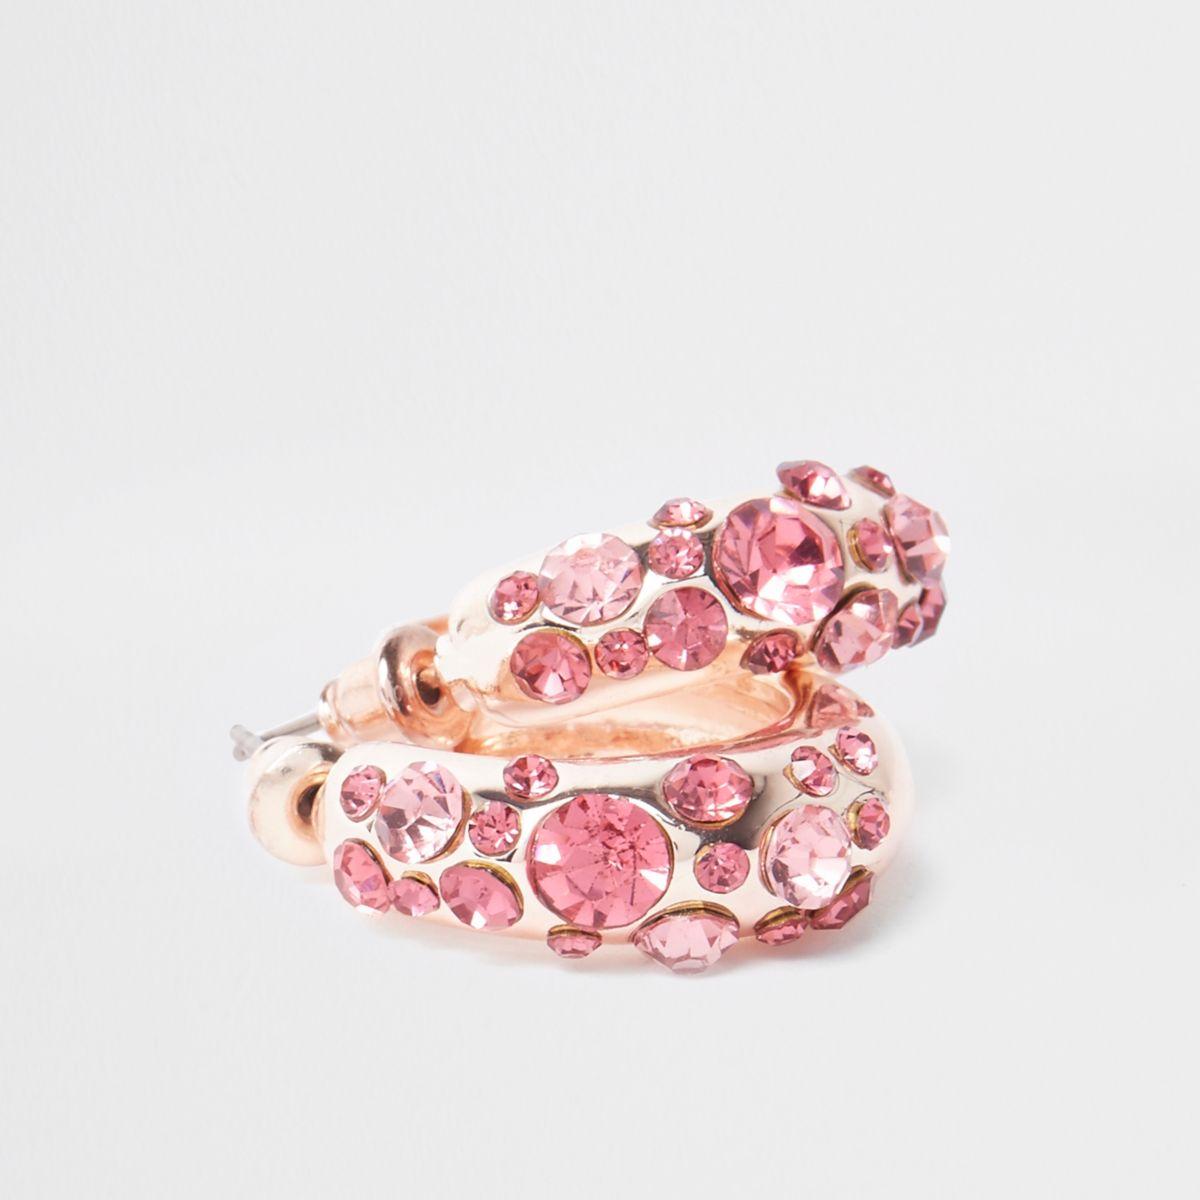 Rose gold tone rhinestone mini hoop earrings - Jewelry - Sale - women